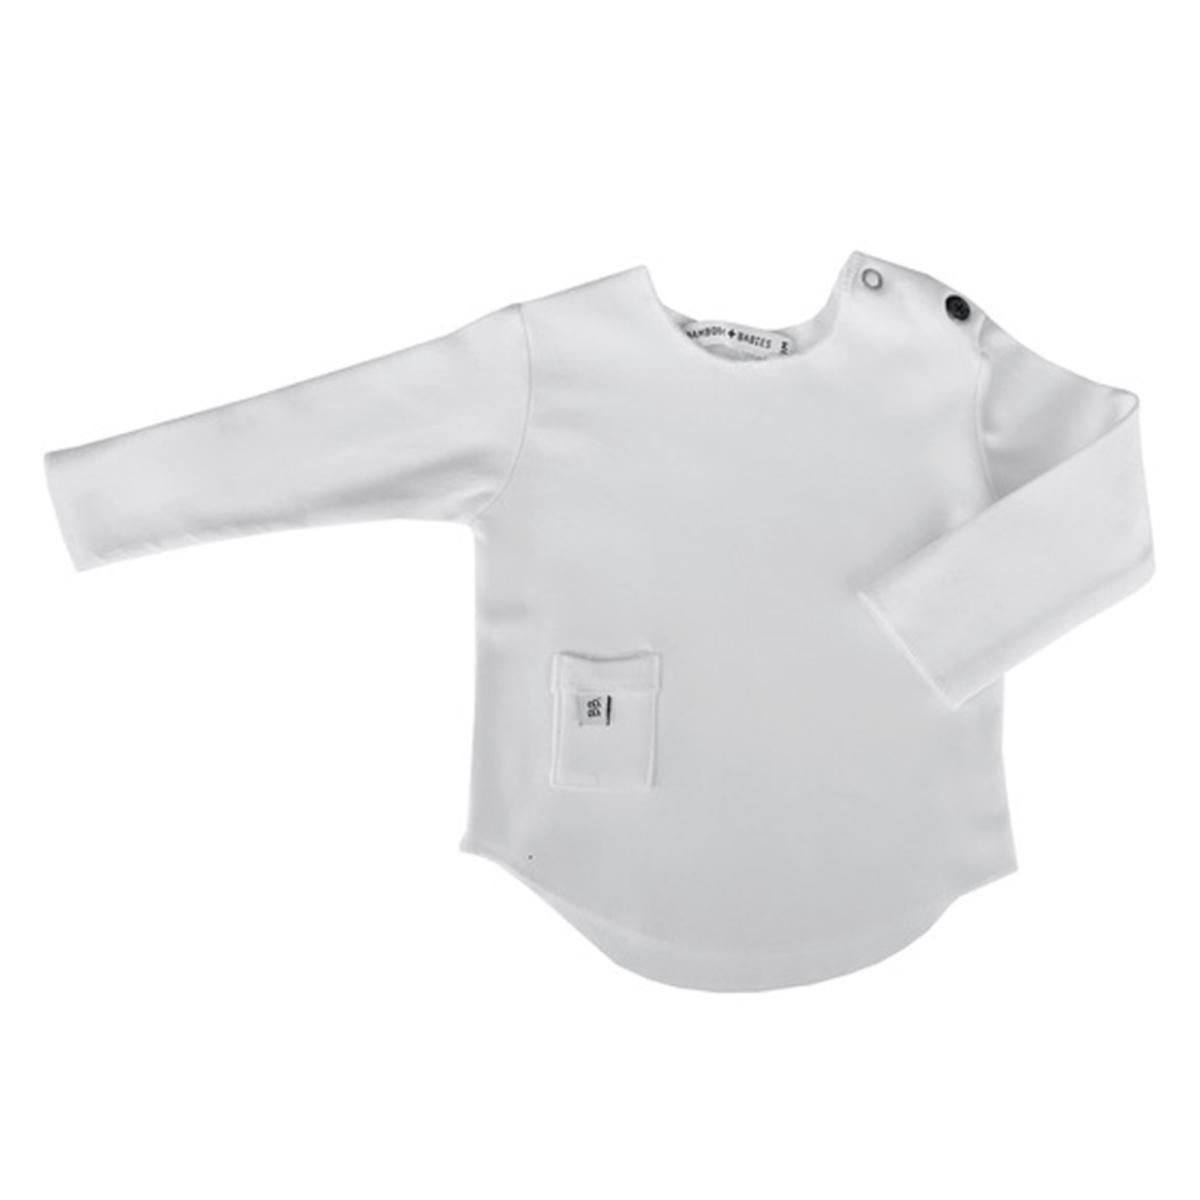 Haut bébé Tee-Shirt Manches Longues Blanc - 3 Mois Tee-Shirt Manches Longues Blanc - 3 Mois